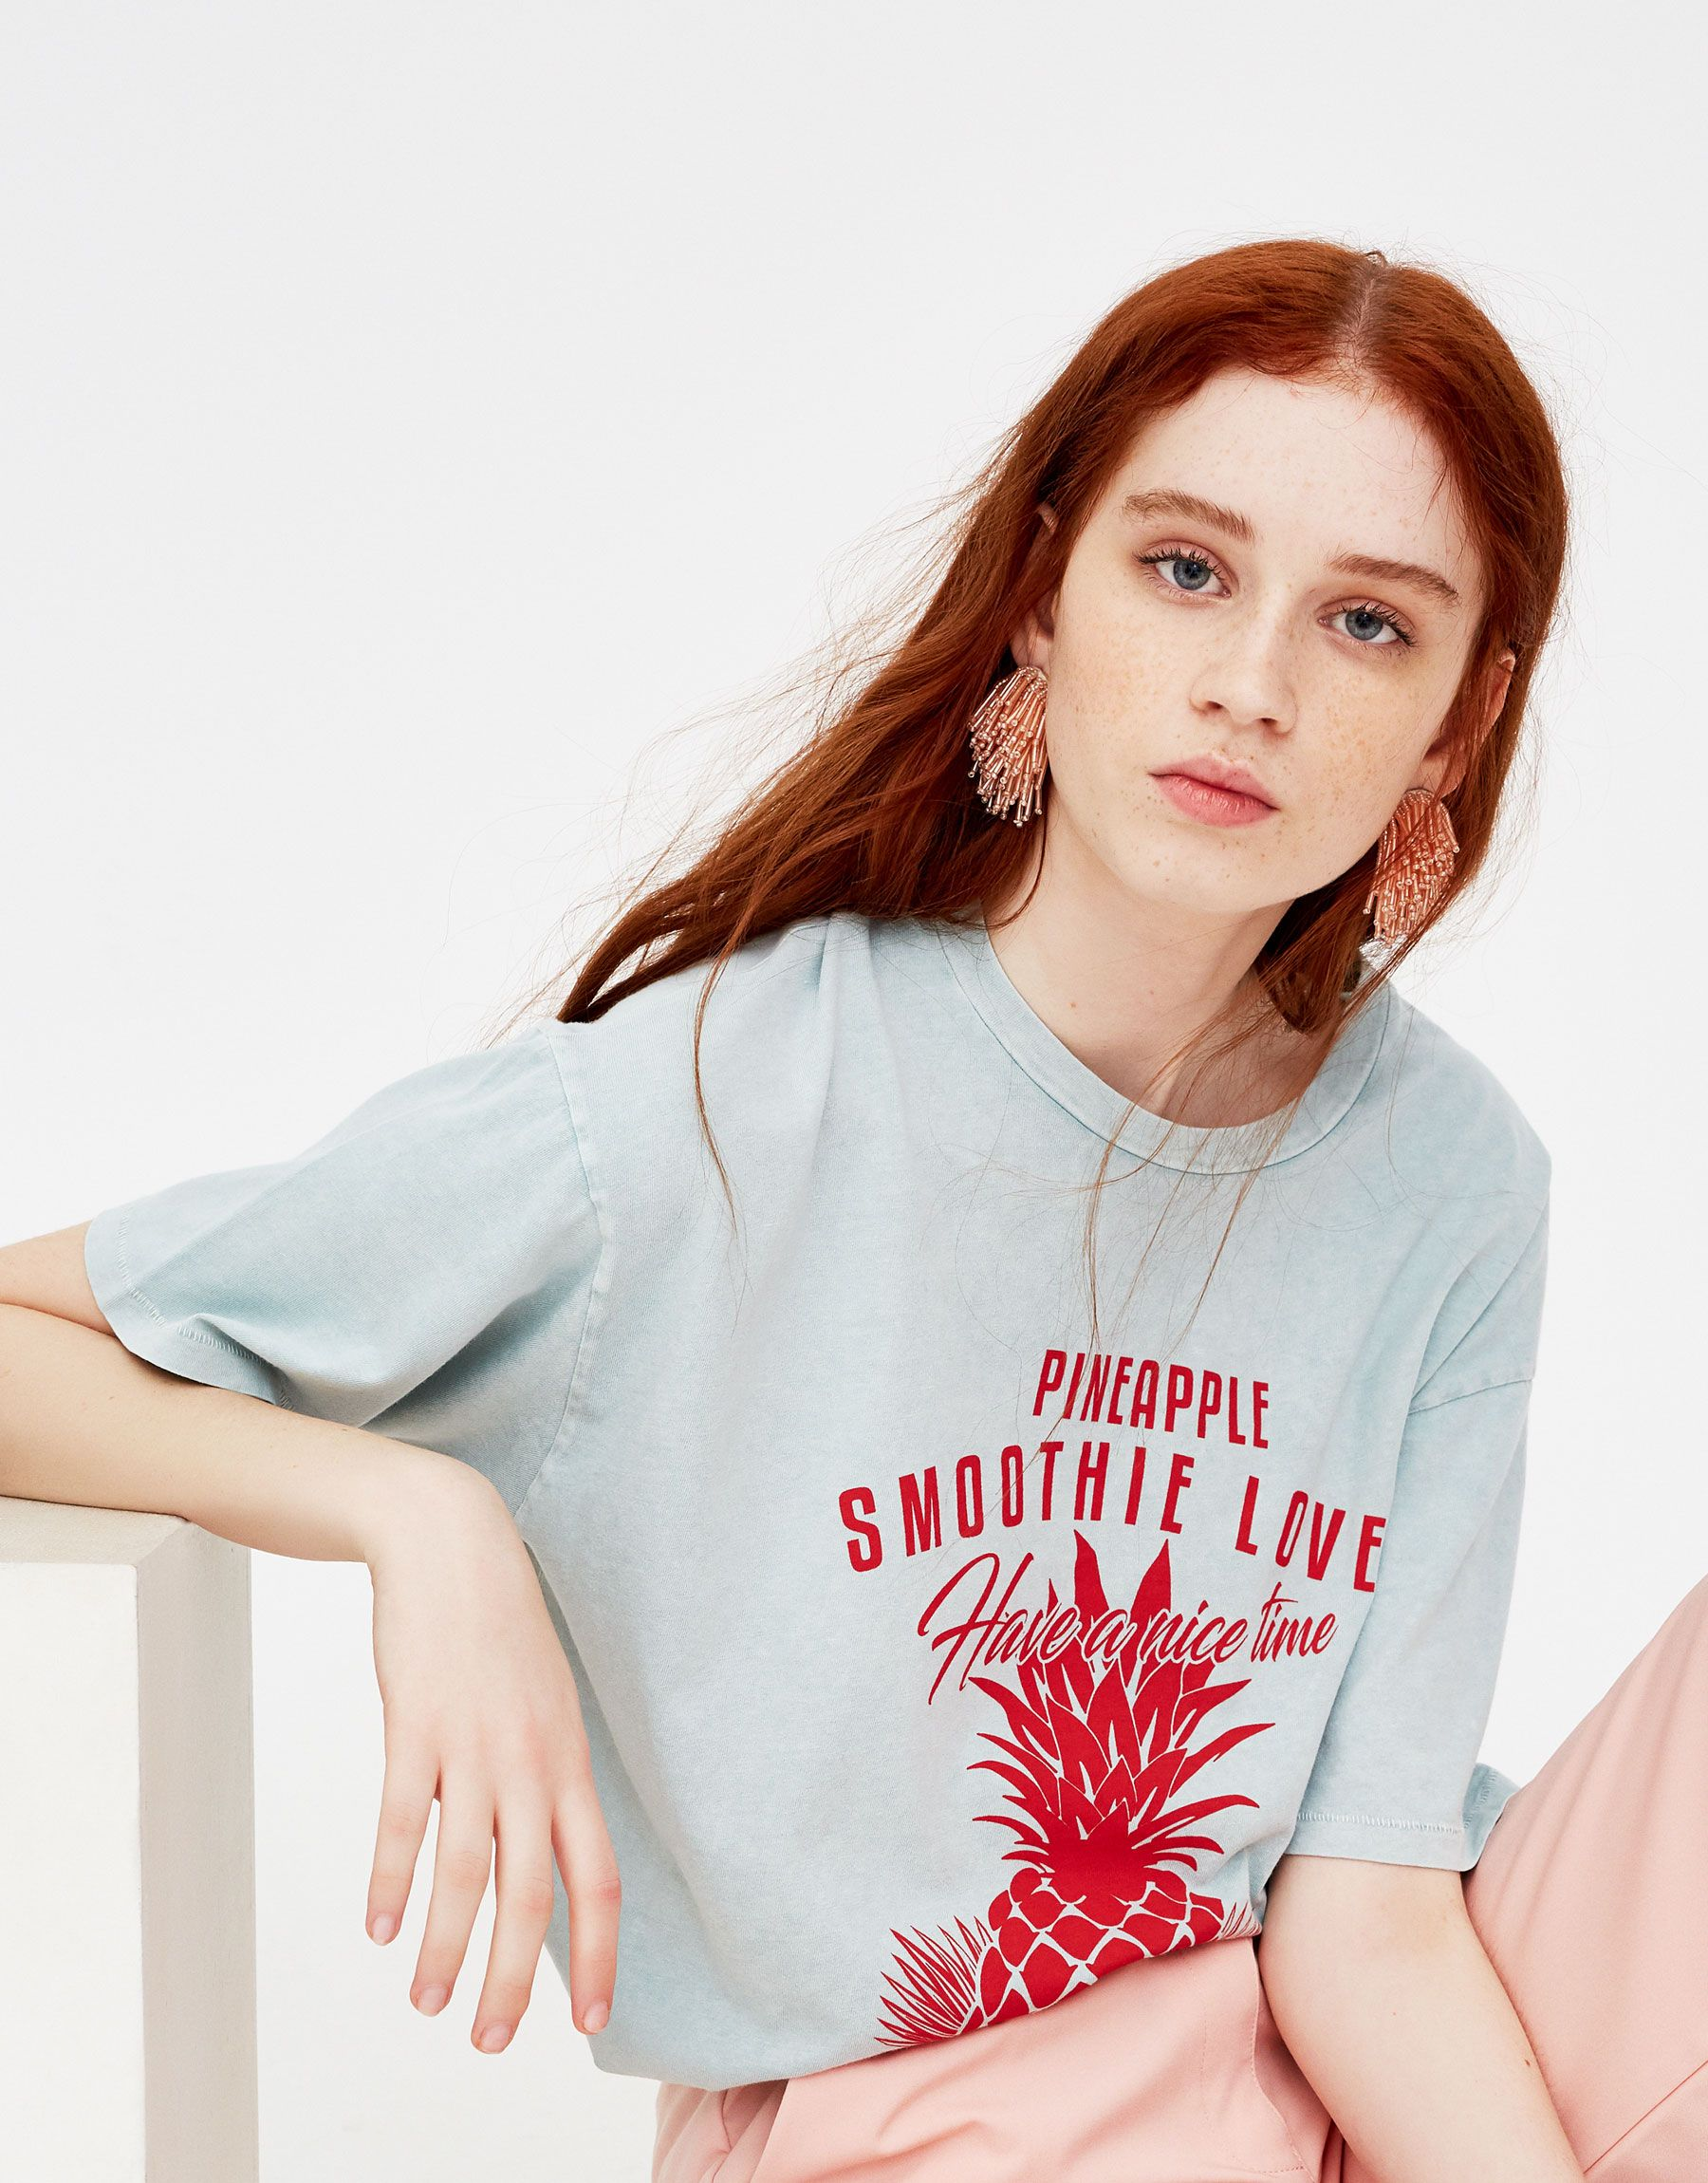 Pineapple Print T Shirt T Shirts Clothing Woman Pull Bear United Kingdom Frauen T Shirts Kleidung Kleidung Damen